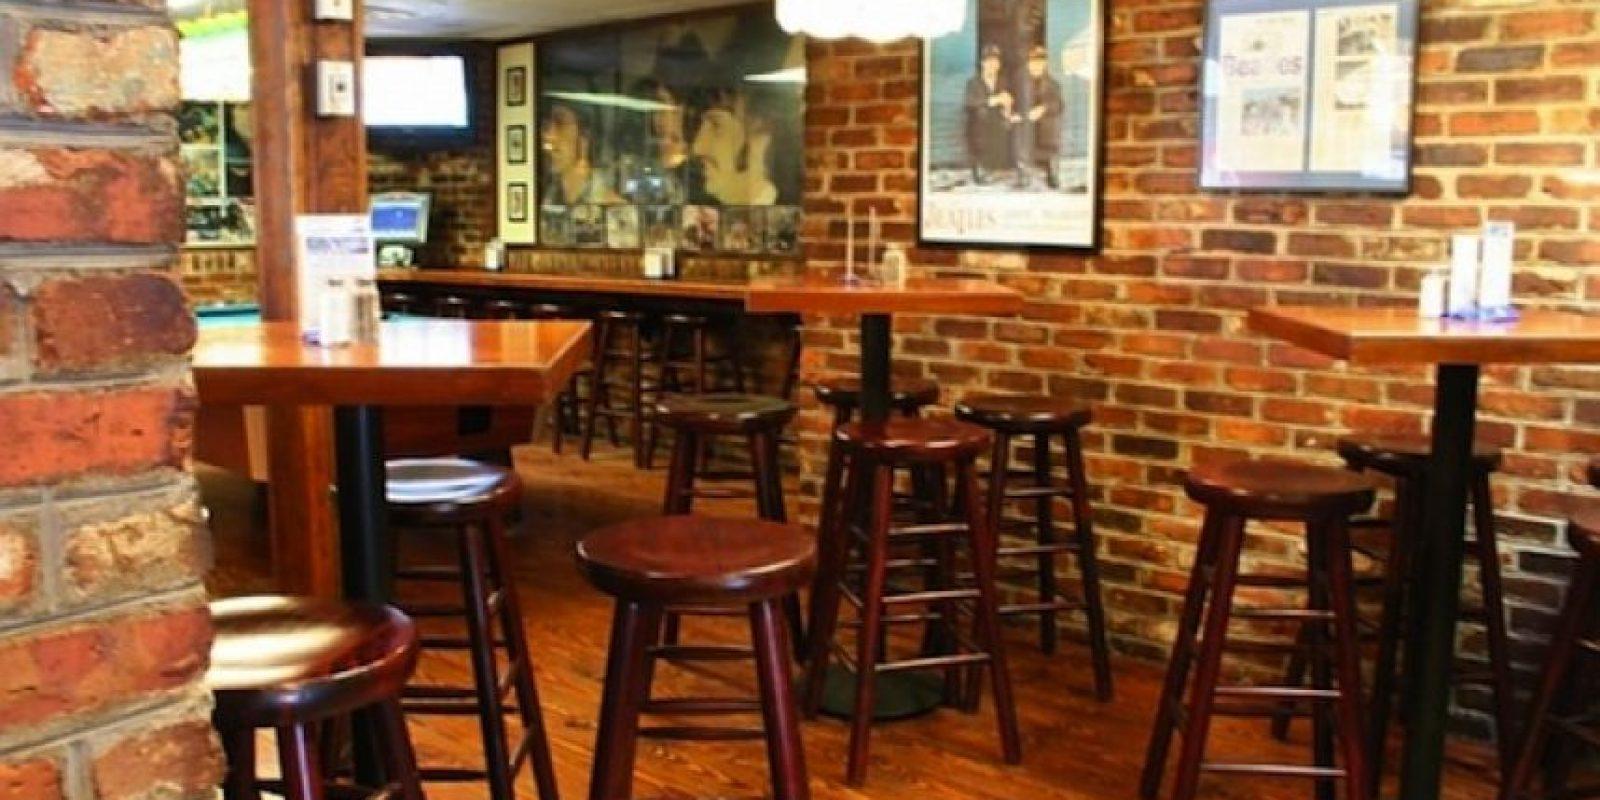 Abbey Road Pub & Restaurant, Virginia Beach Foto:abbeyroadpub.com